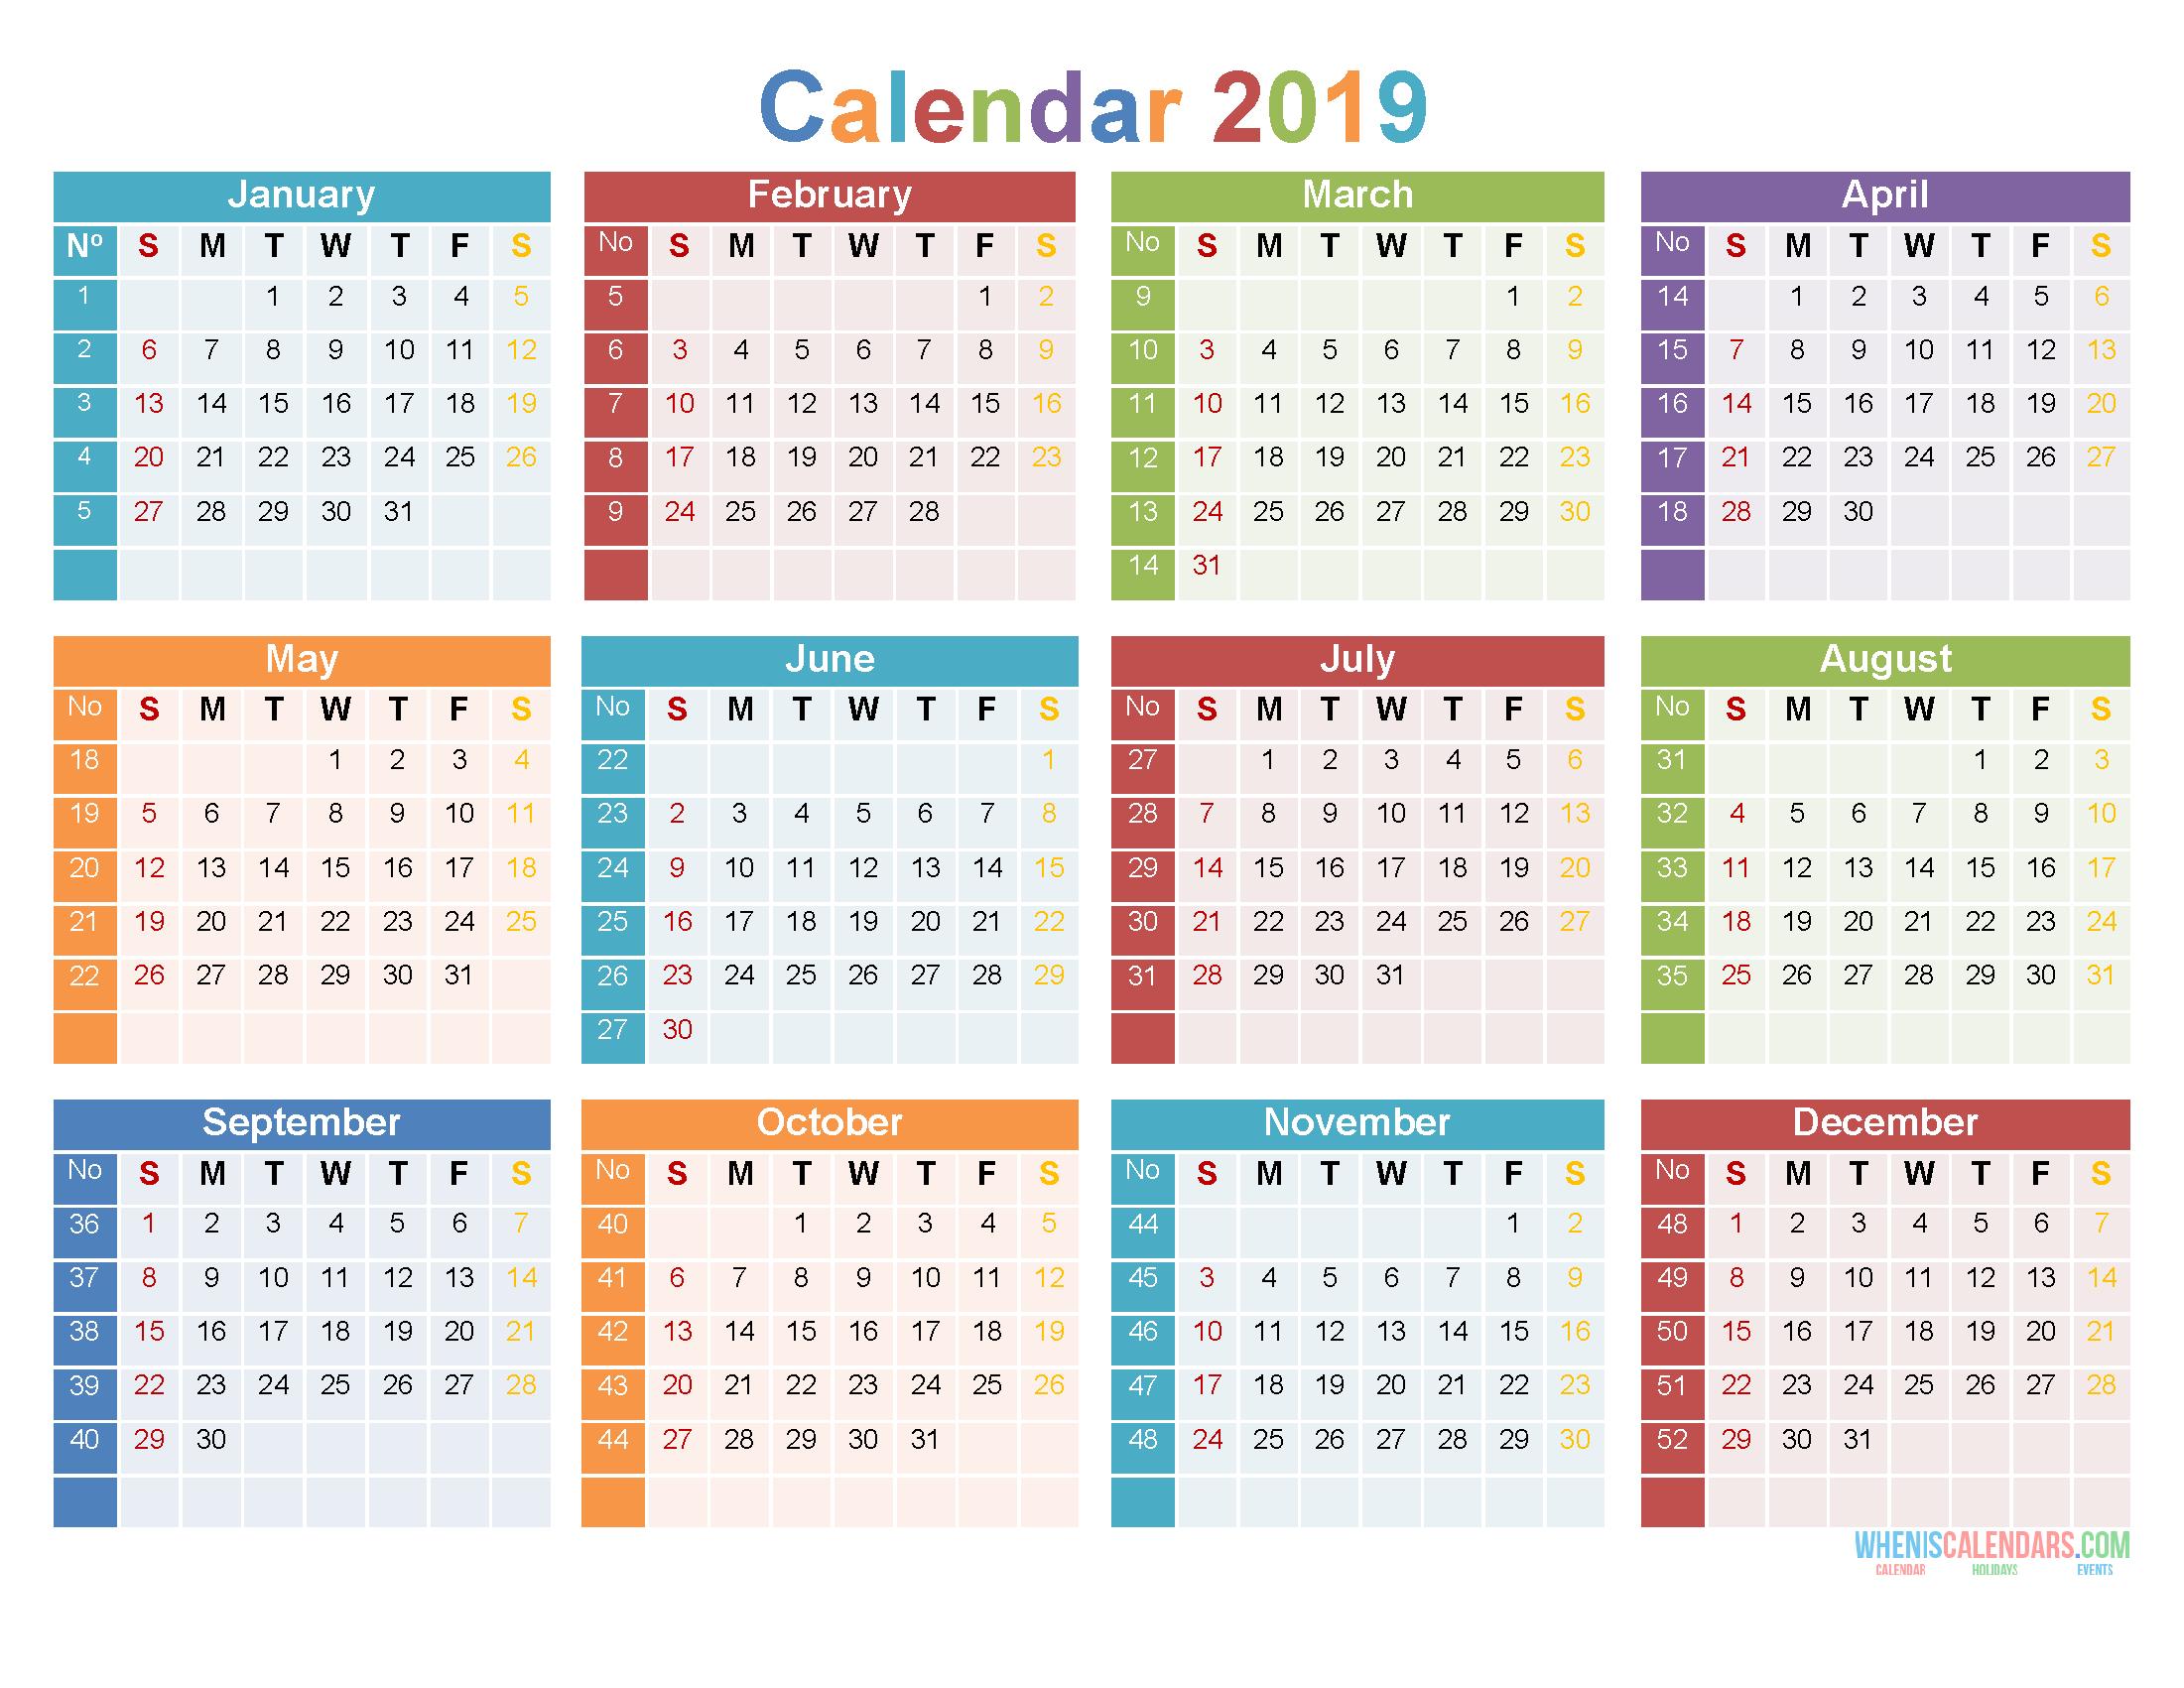 2019 12 Month Calendar Template Large Print Calendar PDF, Image